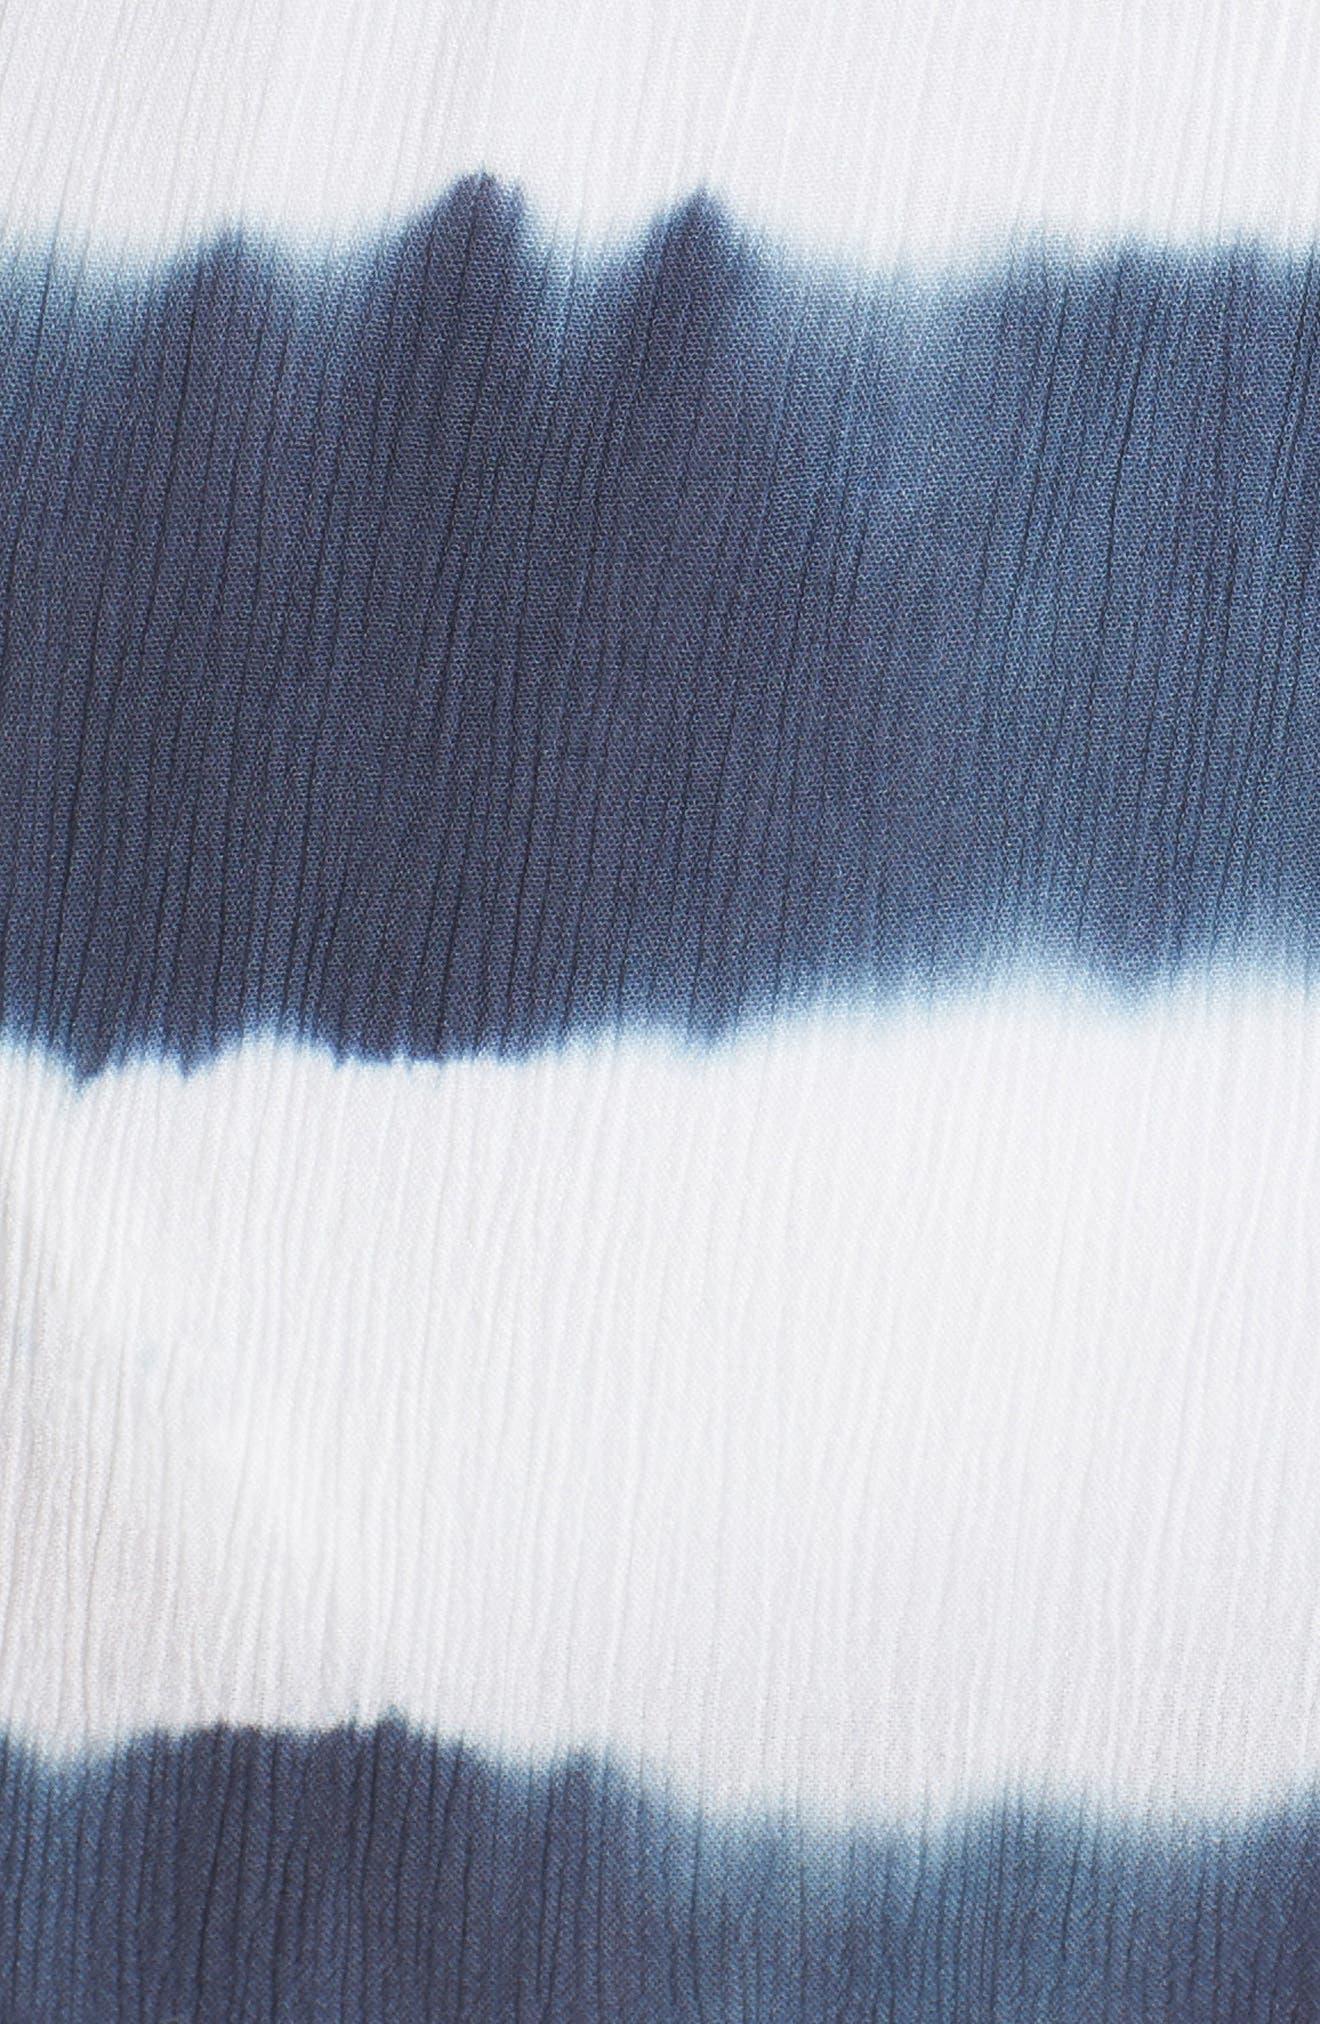 Cold Shoulder Cover-Up Maxi Dress,                             Alternate thumbnail 5, color,                             Td Indigo/ White